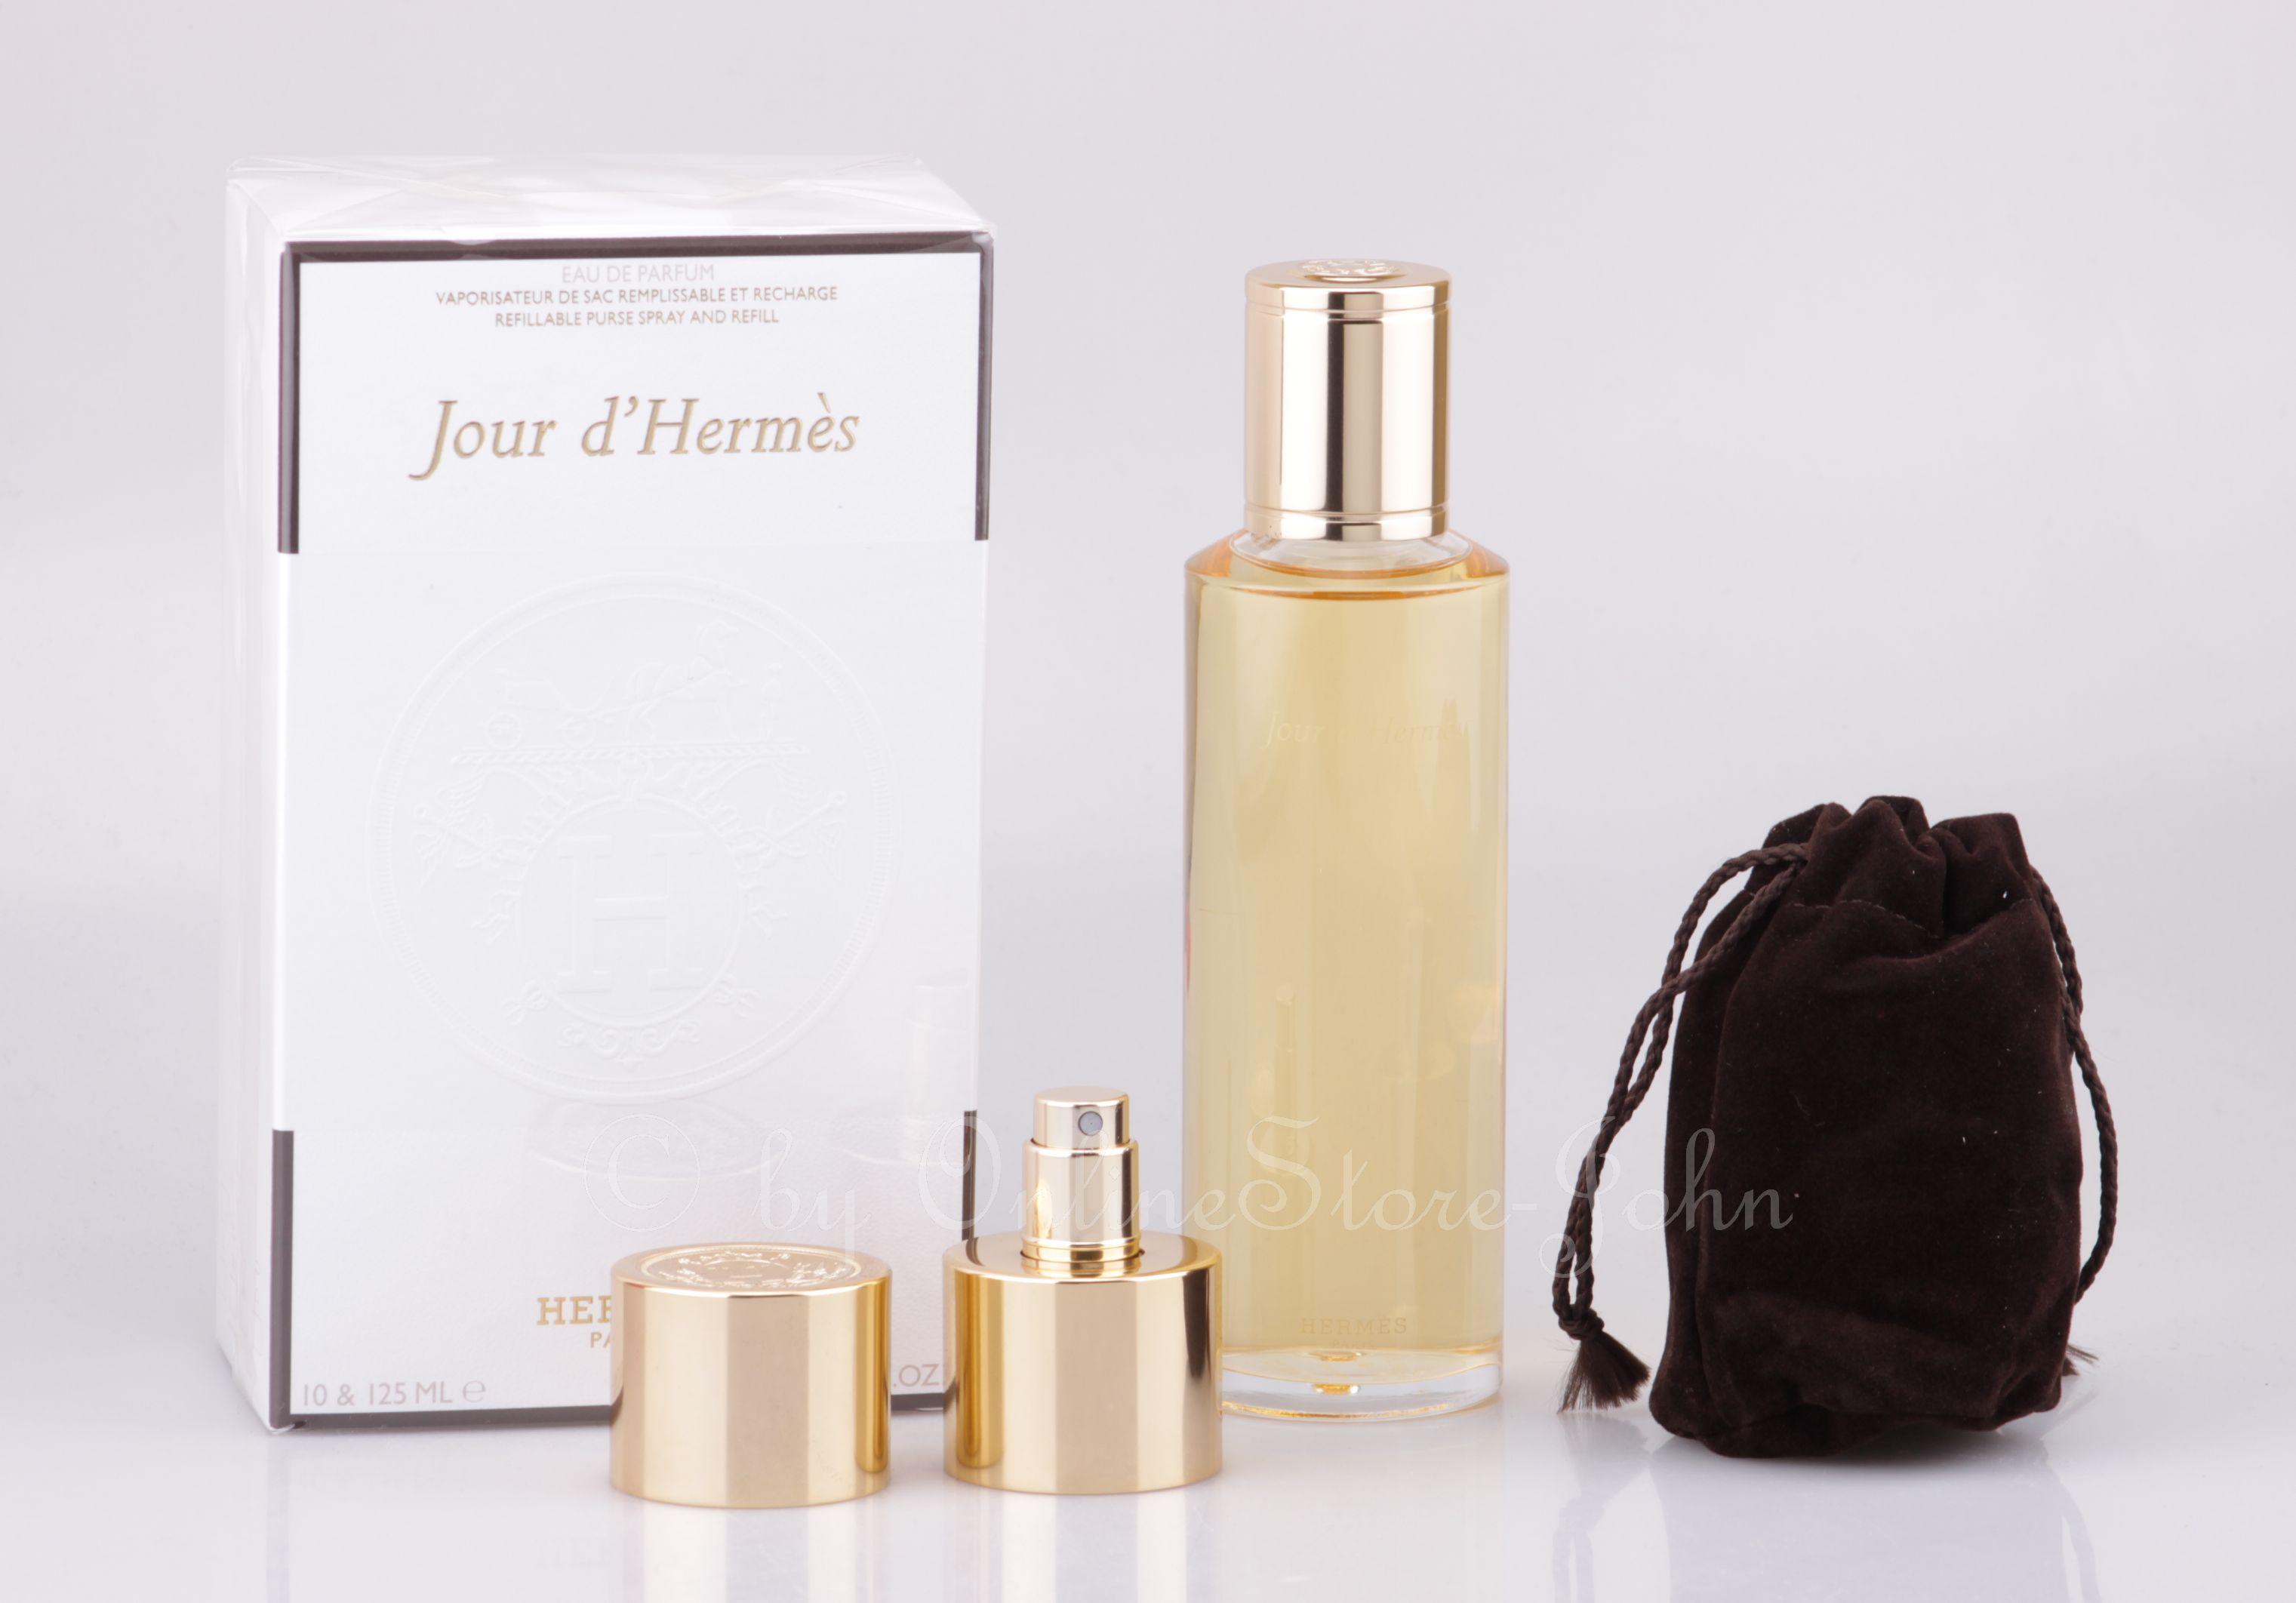 Hermes De Jour D'hermes Edp125ml Eau Set 10ml Parfum N80wvnyOm